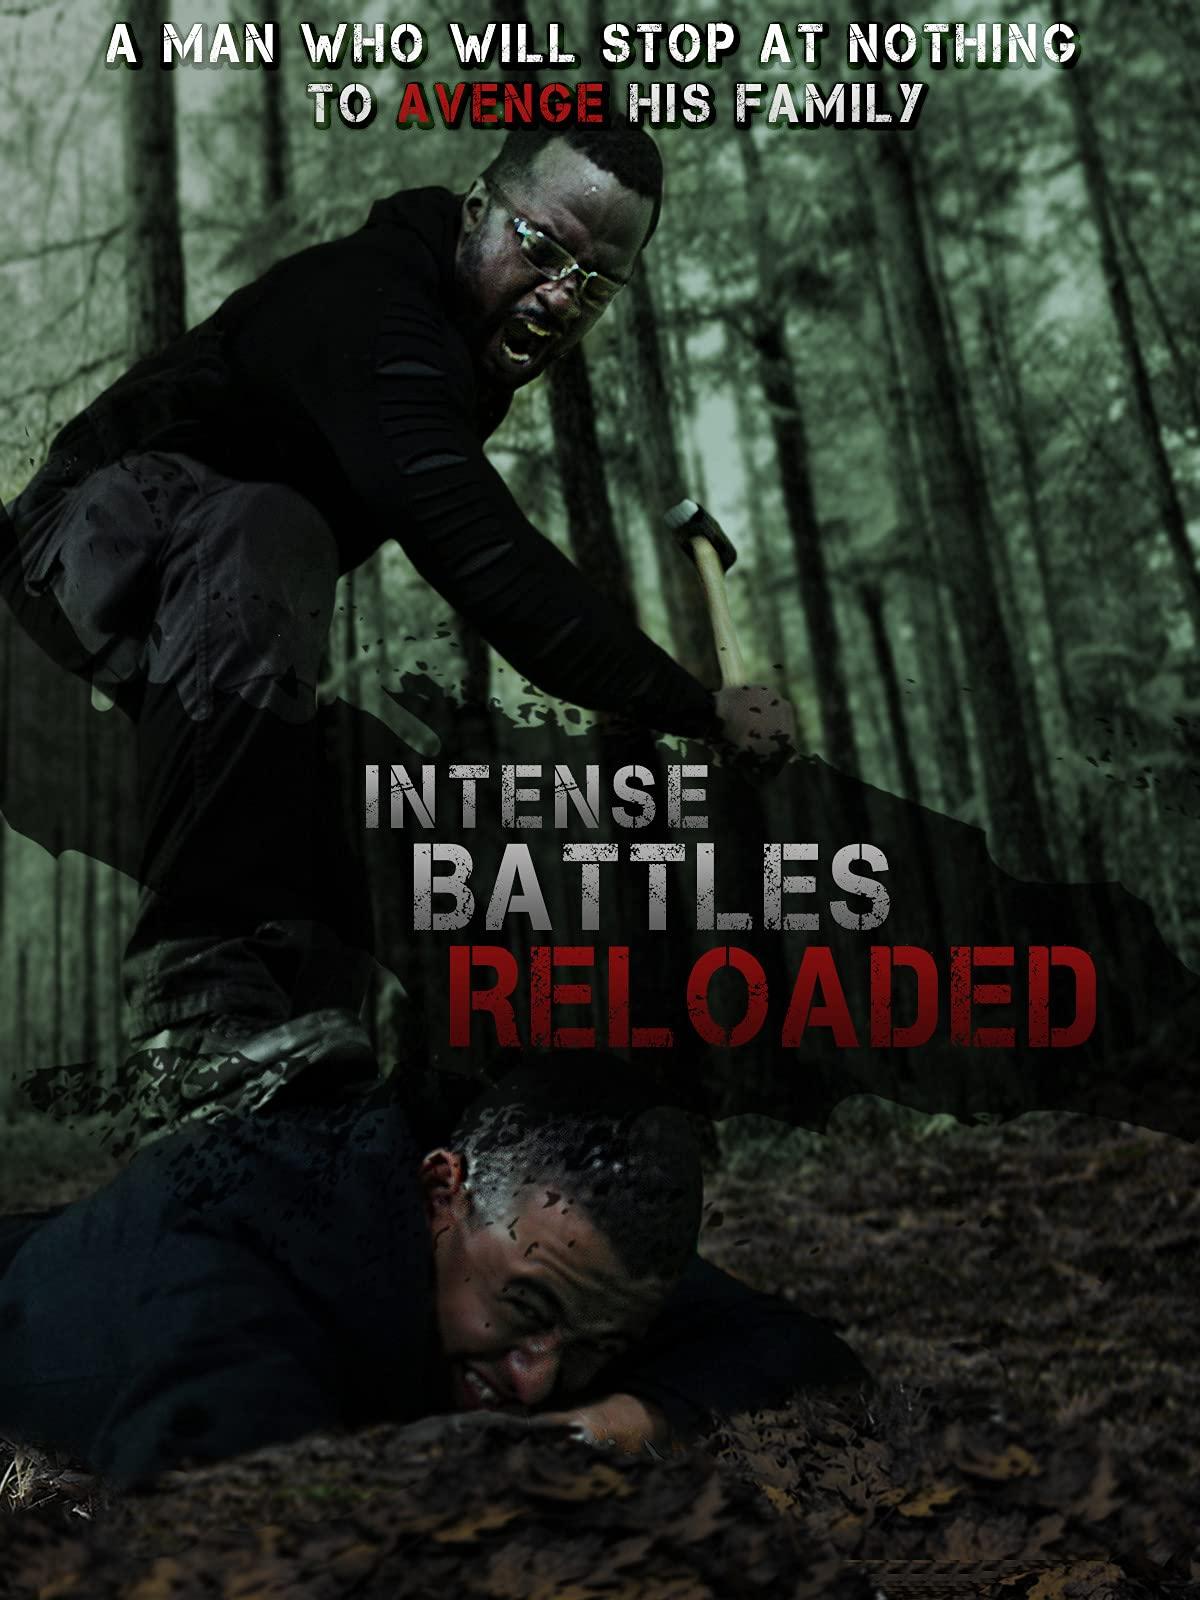 Intense Battles Reloaded